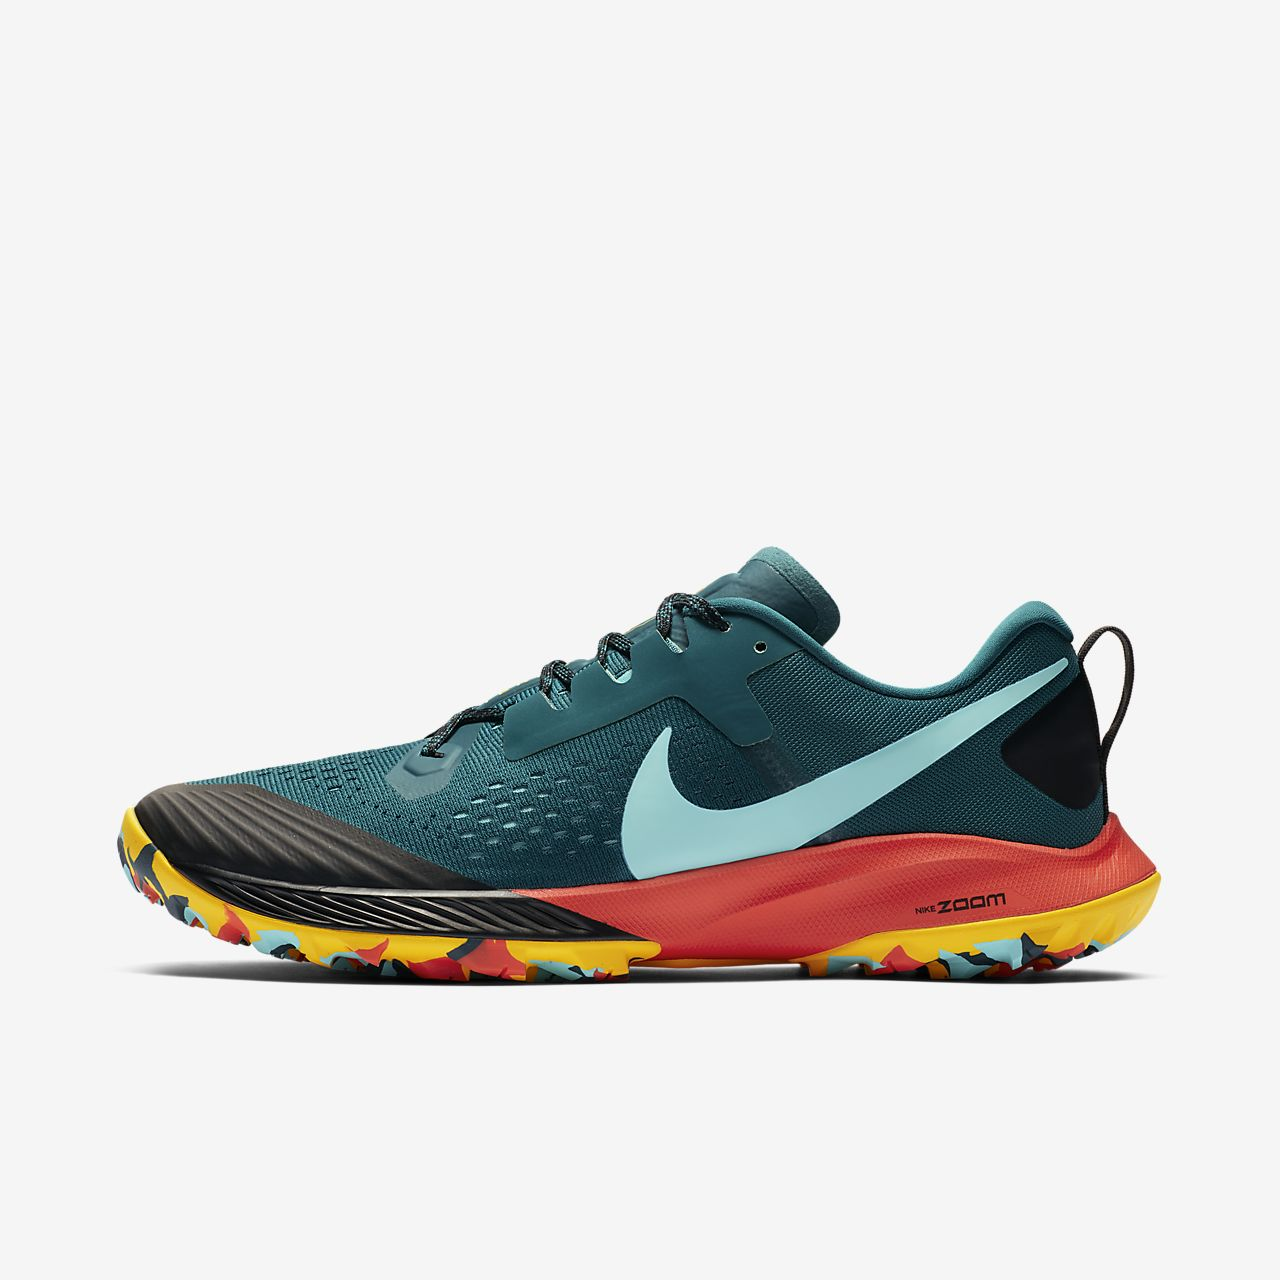 5a069c74 Męskie buty do biegania Nike Air Zoom Terra Kiger 5. Nike.com PL